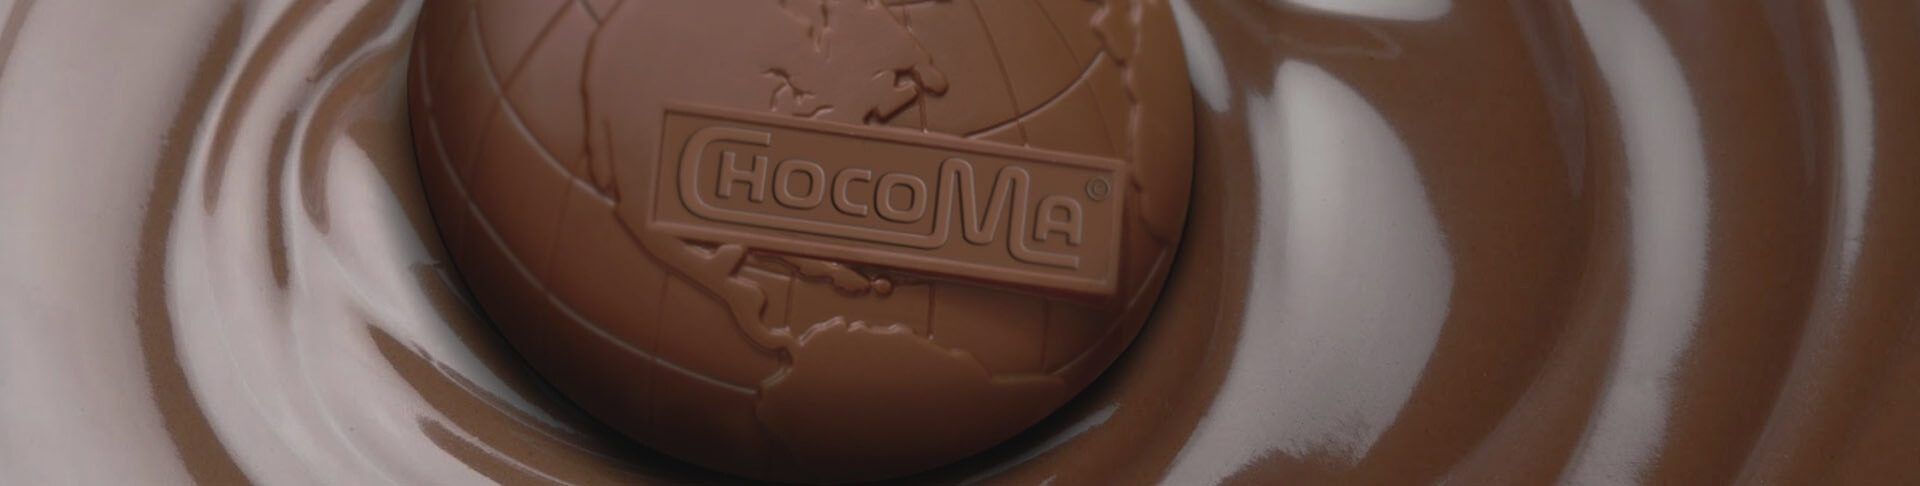 chocoma